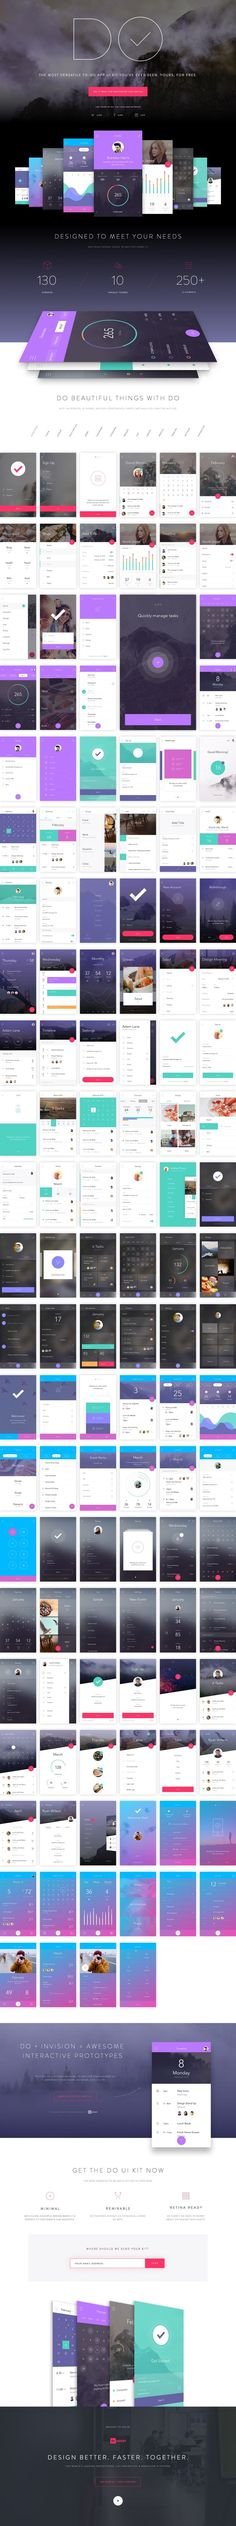 Loves Data Loves| Get DO UI Kit for Photoshop & Sketch by Anton Aheichanka | #UI #userinterface #app || For the latest in technology, online marketing and data analysis, check out www.lovesdata.com/blog/?utm_content=bufferbada5&utm_medium=social&utm_source=pinterest.com&utm_campaign=buffer ||